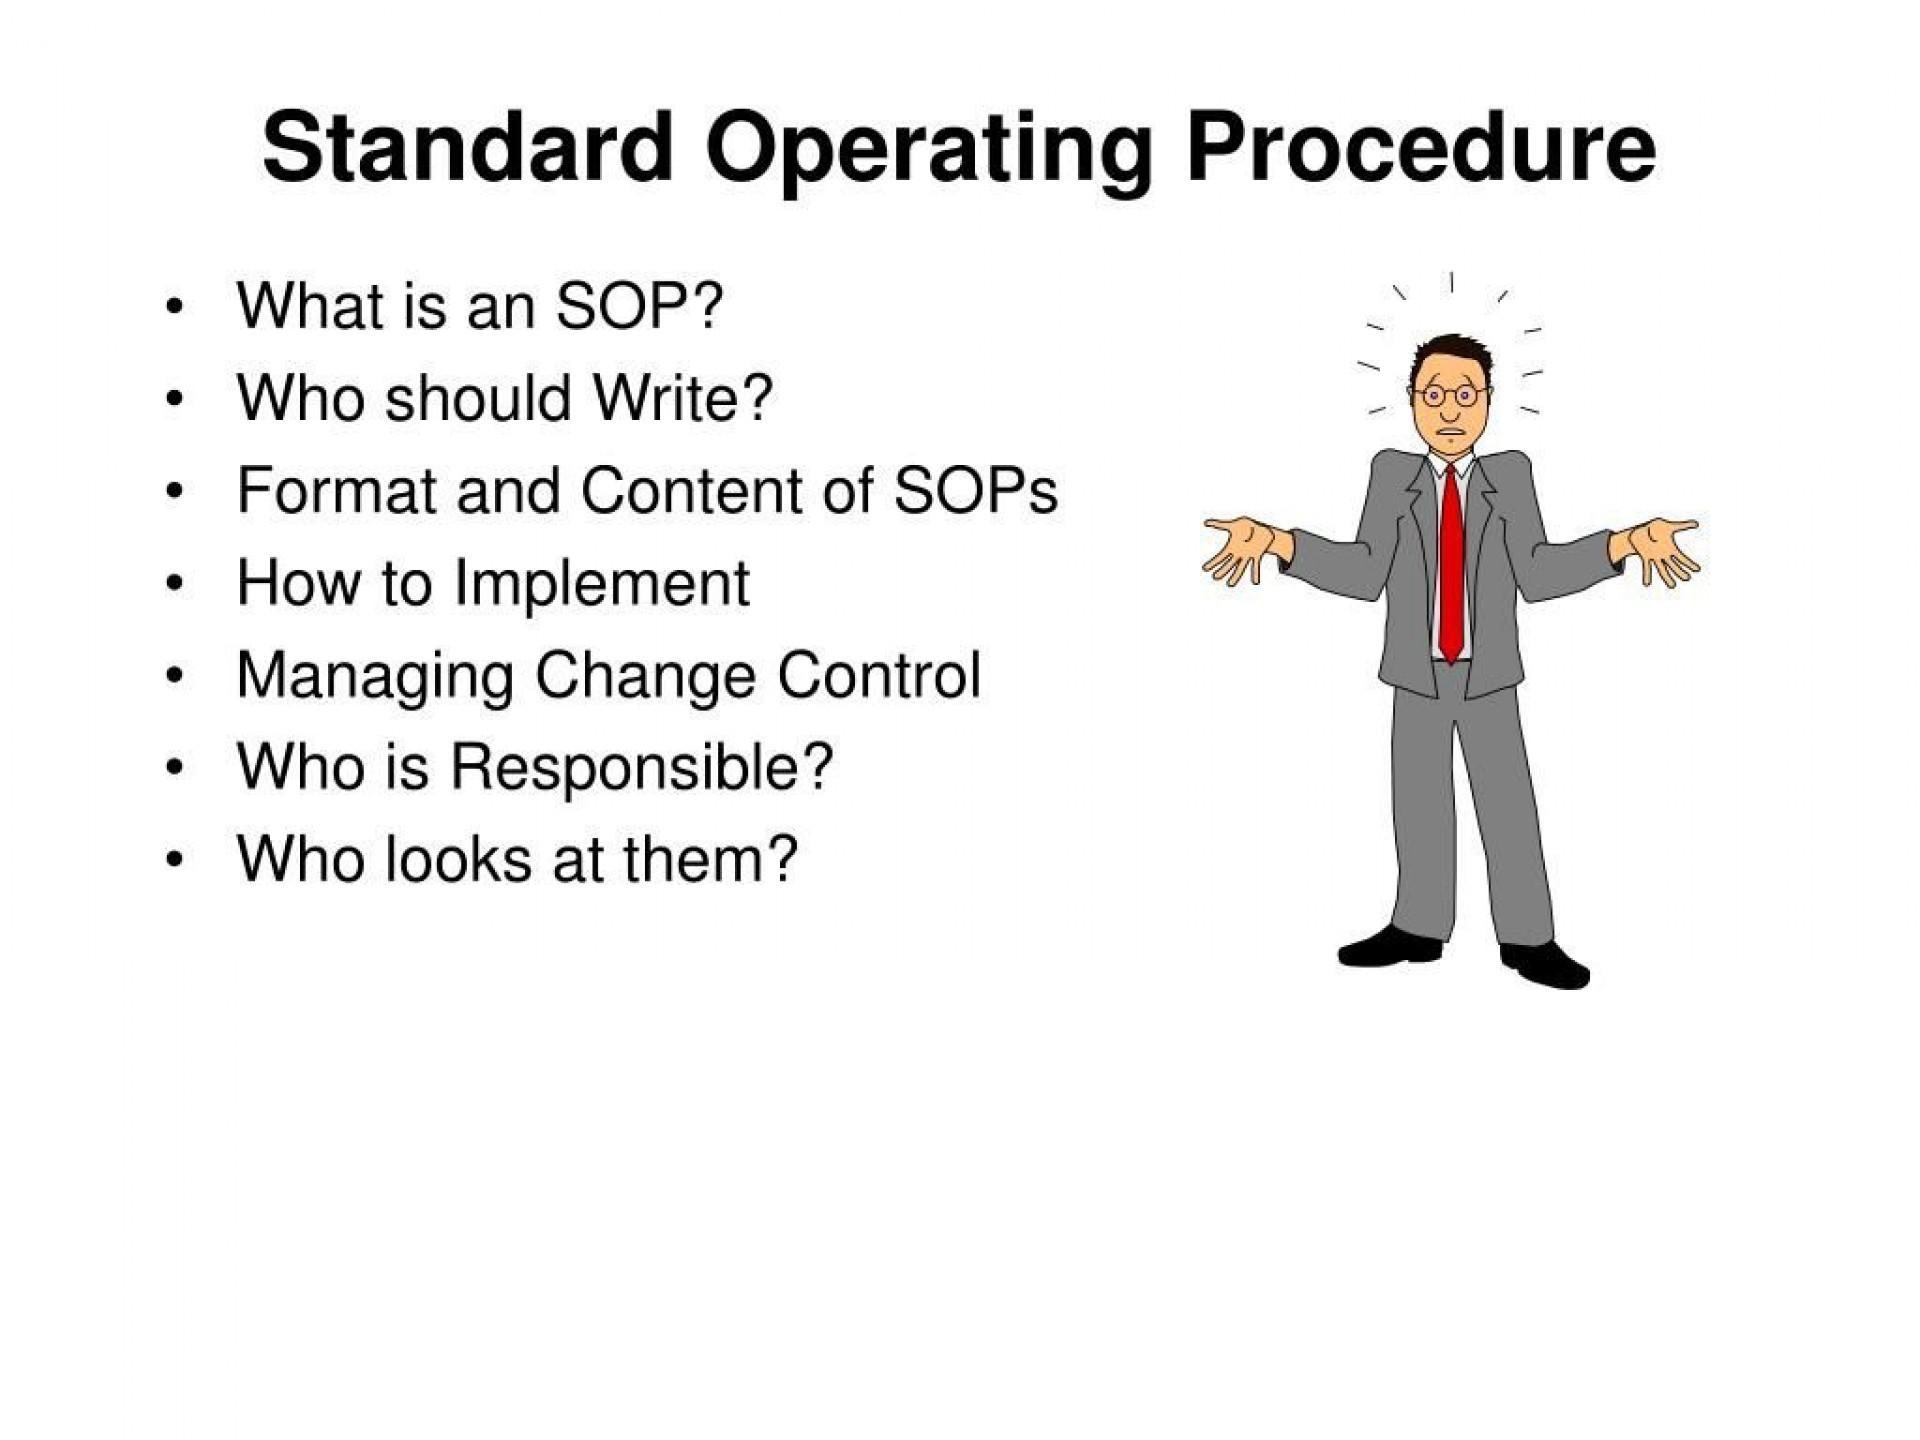 009 Striking Standard Operating Procedure Template Free Sample  Microsoft Word Download 20161920